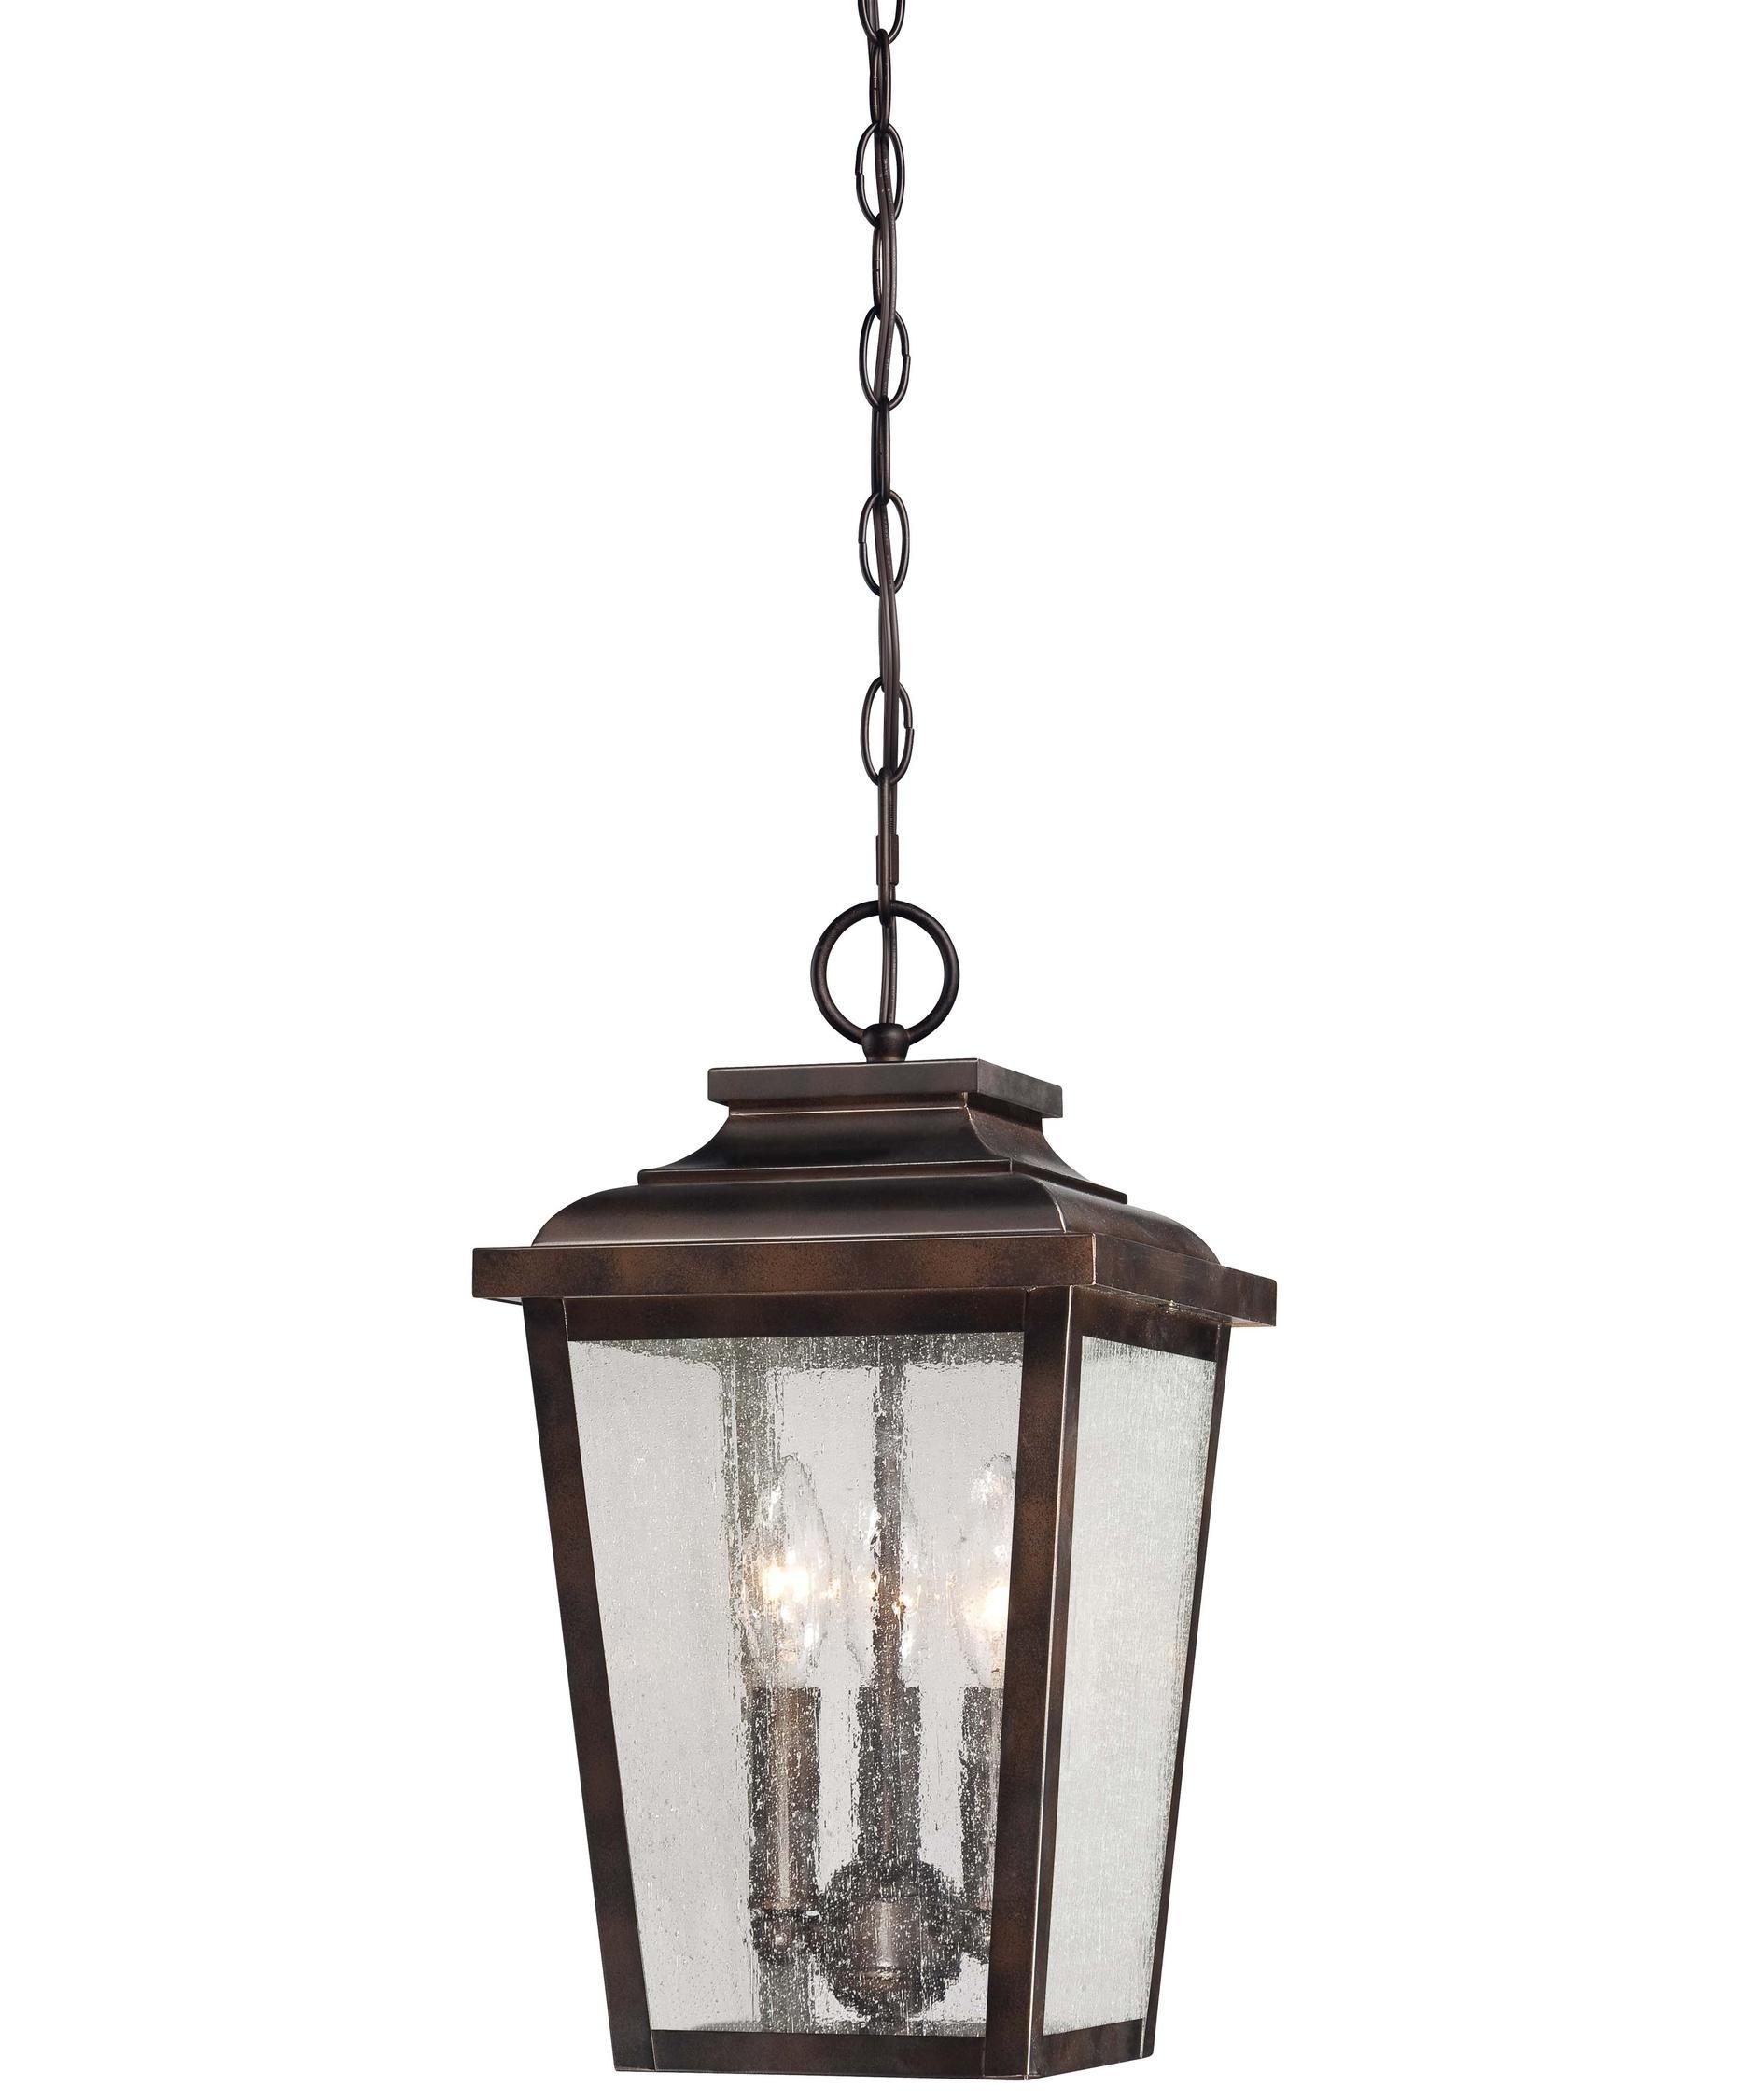 Minka Lavery 72174 Irvington Manor 3 Light Outdoor Hanging Lantern Inside Outdoor Hanging Lights (View 4 of 15)